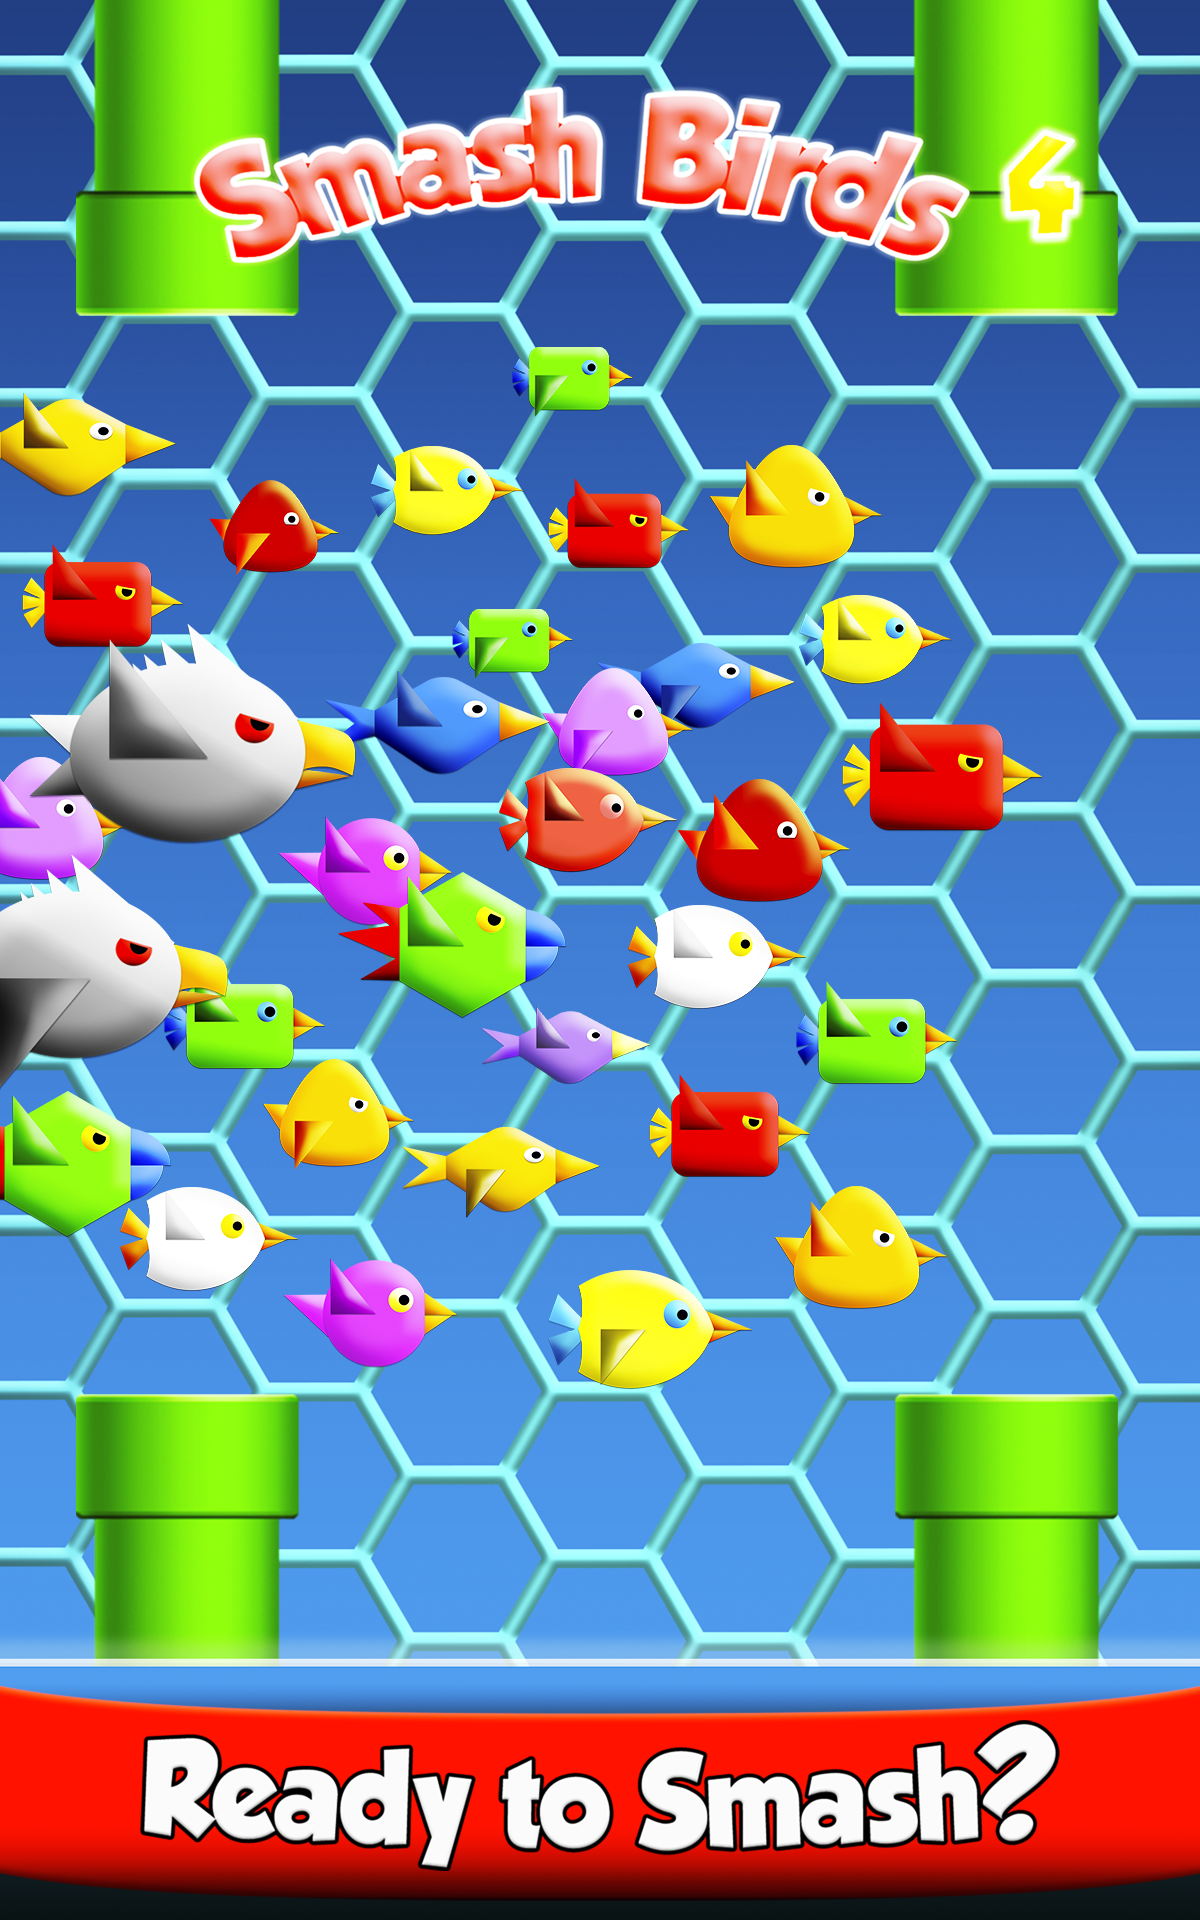 Smash Birds 4: Action Free Cool Game, Free Addictive App (Pocked Edition PE)